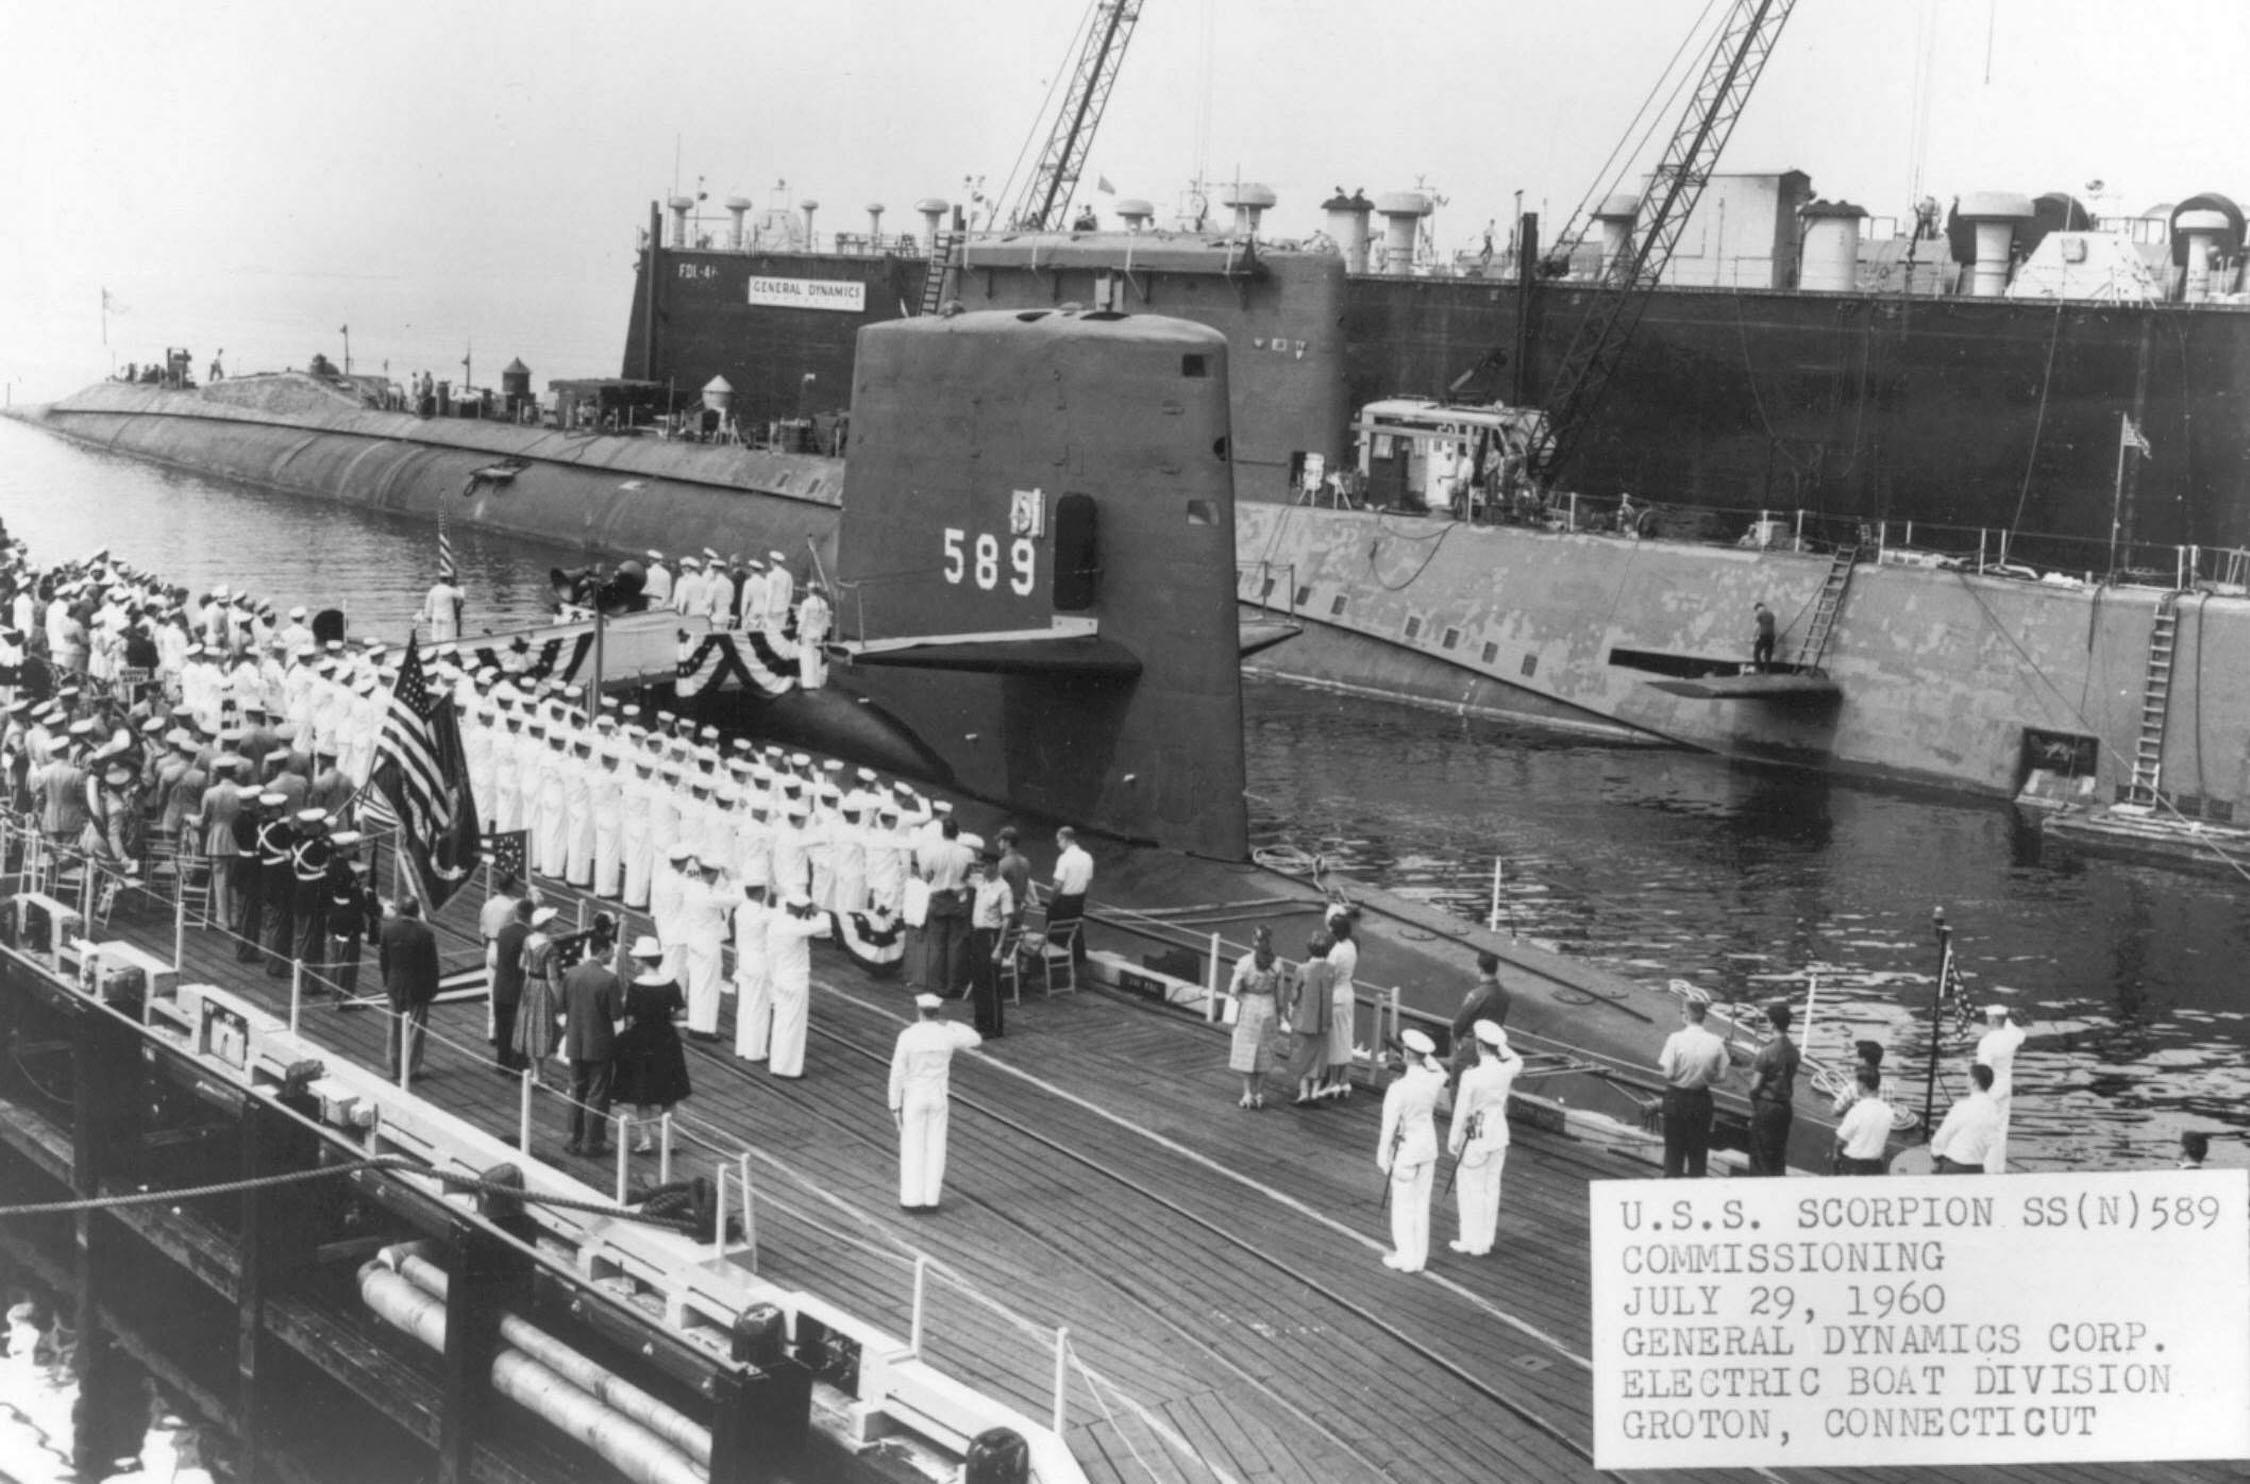 Commissioning of the U.S.S. Scorpion, 29 July 1960.  Photo # USN 1051824, courtesy of Scott Koen and ussnewyork.com.